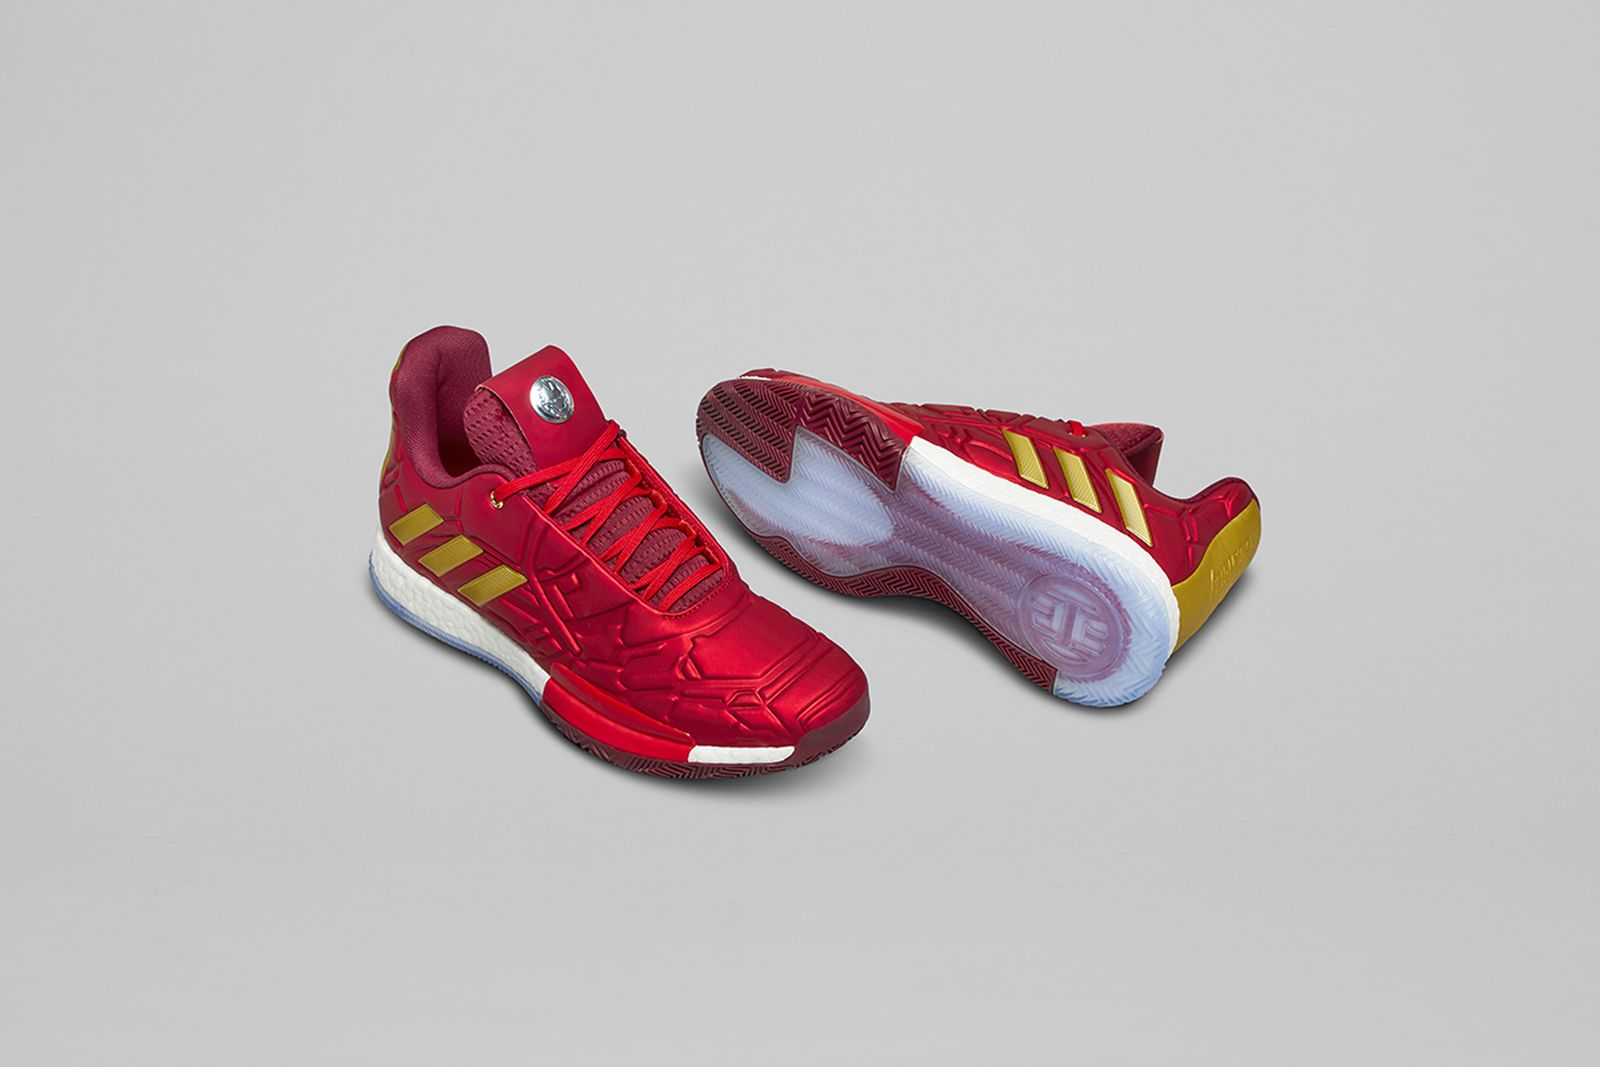 marvel adidas basketball sneakers release date price Avengers: Endgame